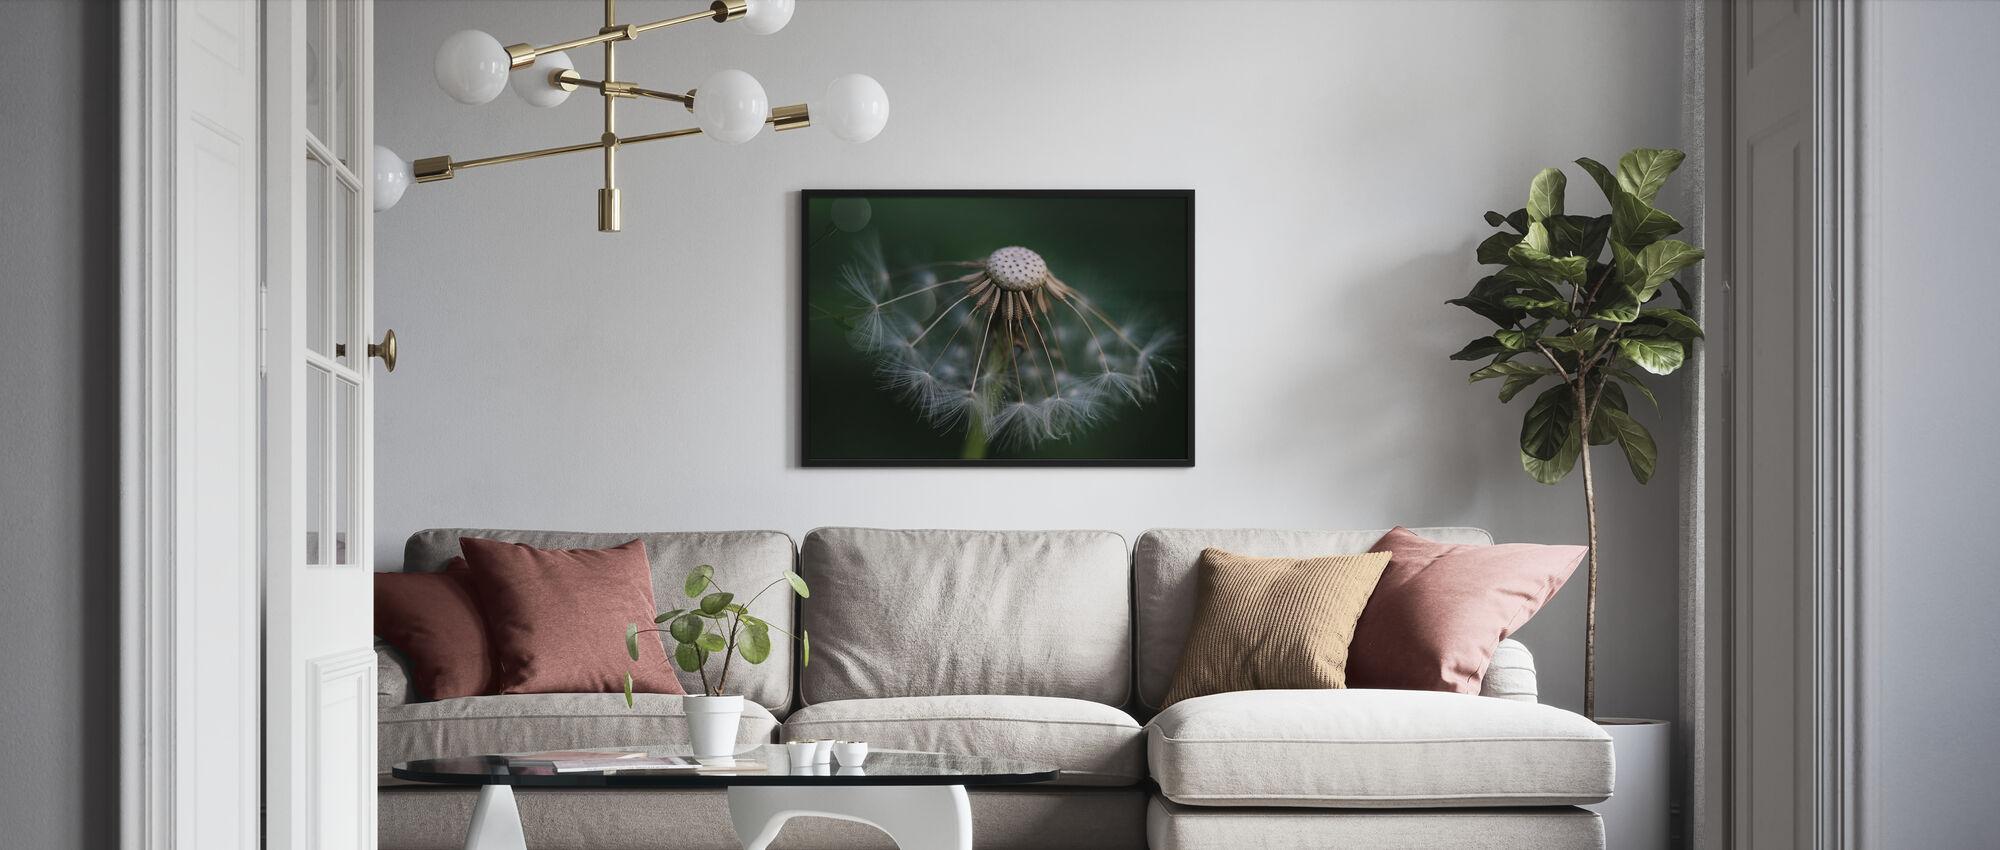 Dandelion - Poster - Living Room